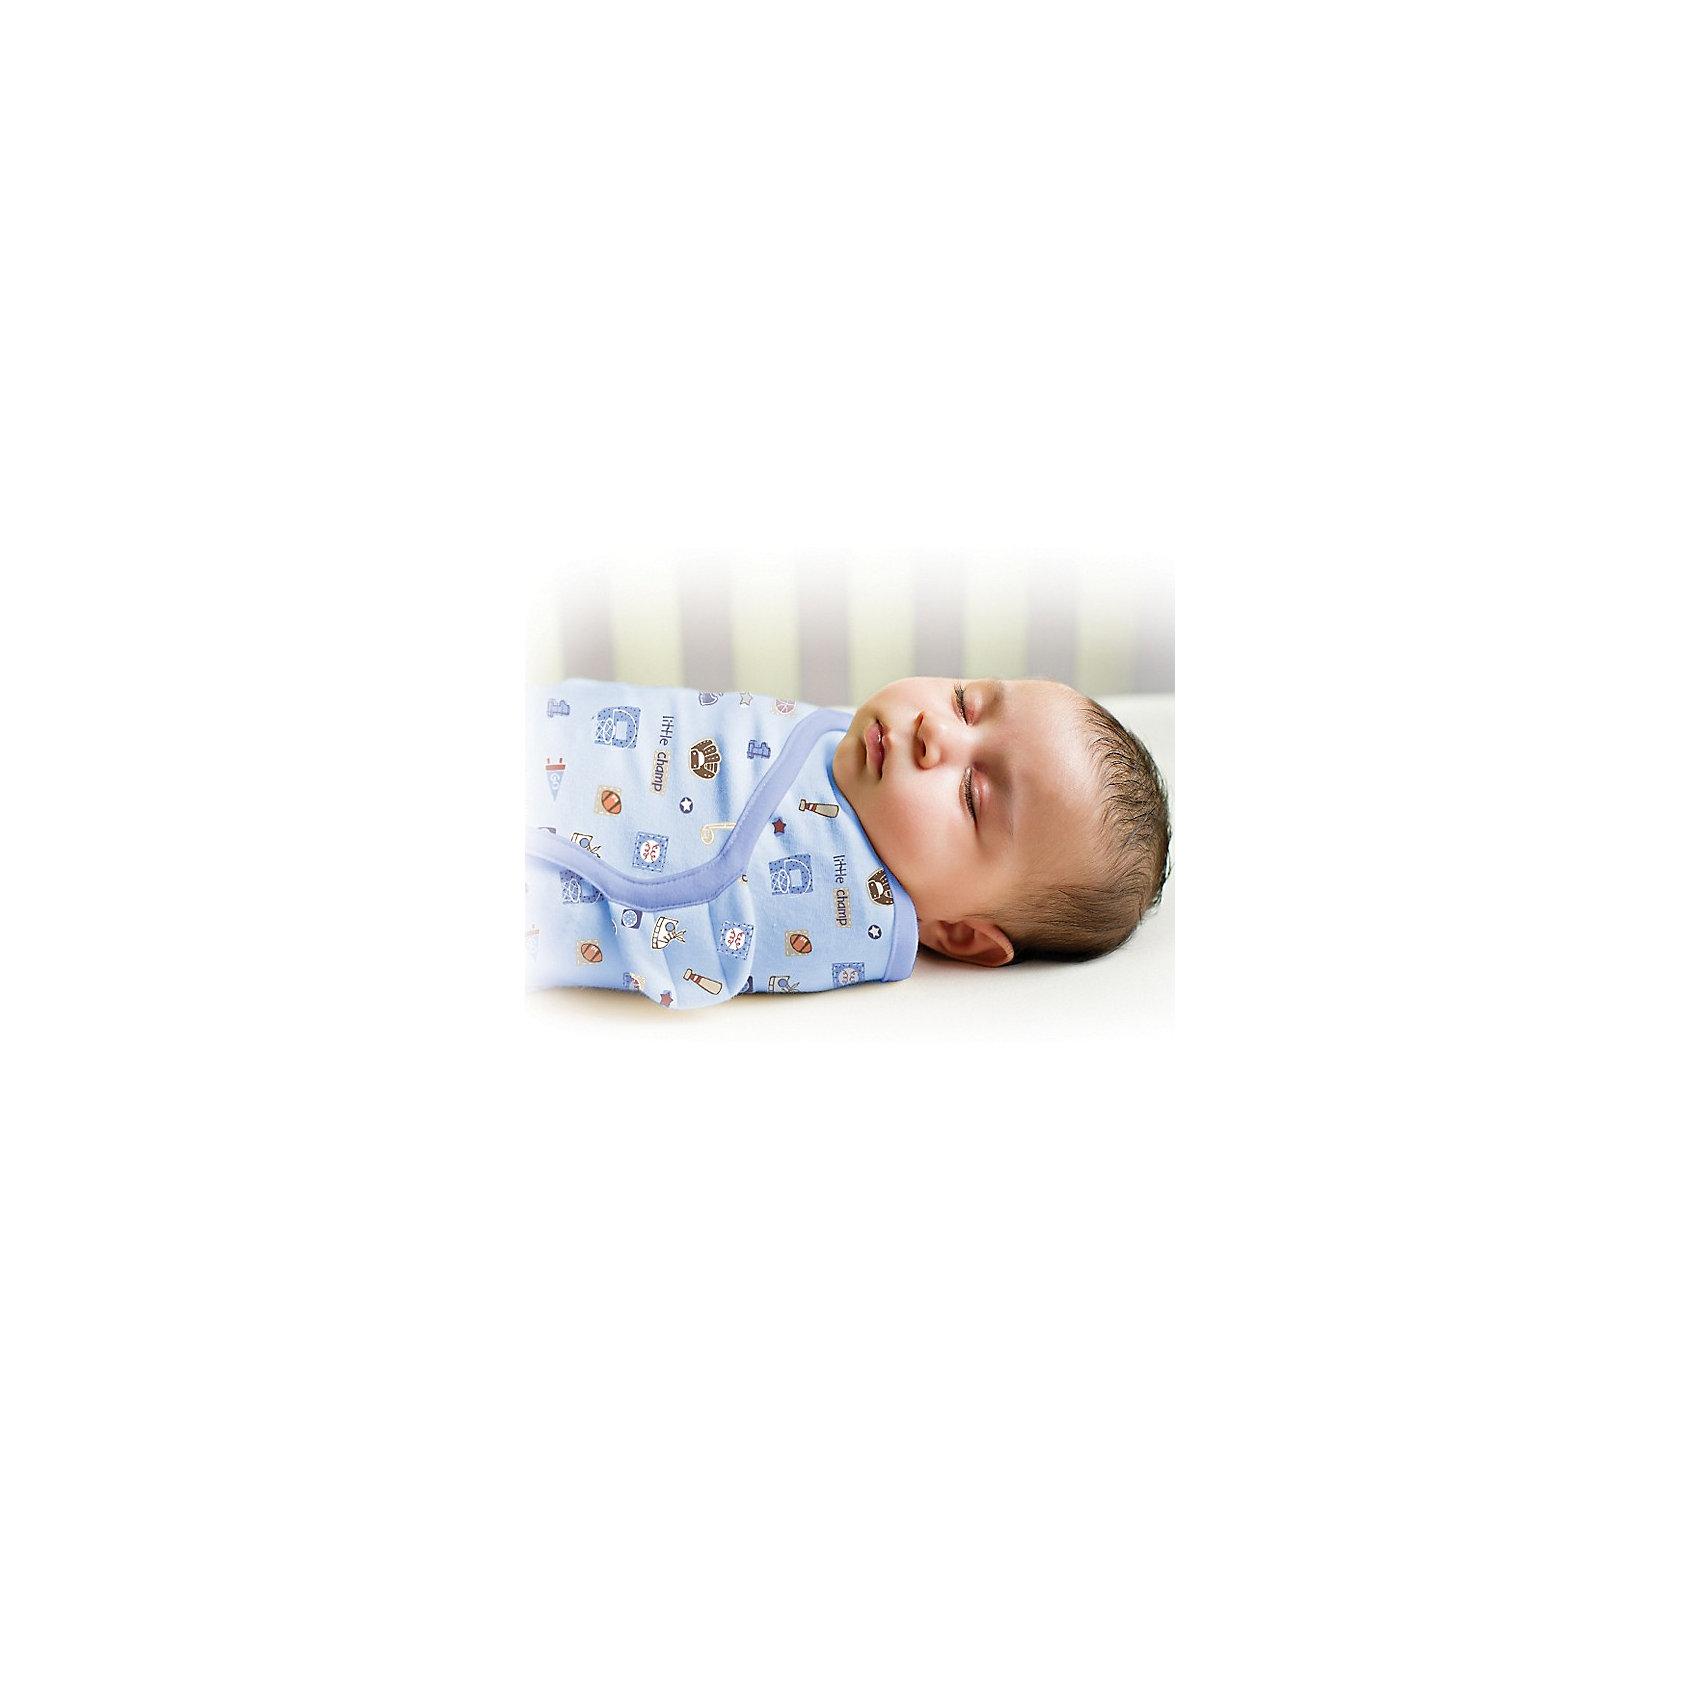 Конверт для пеленания на липучке SWADDLEME® S/M, Summer Infant, маленький чемпион от myToys